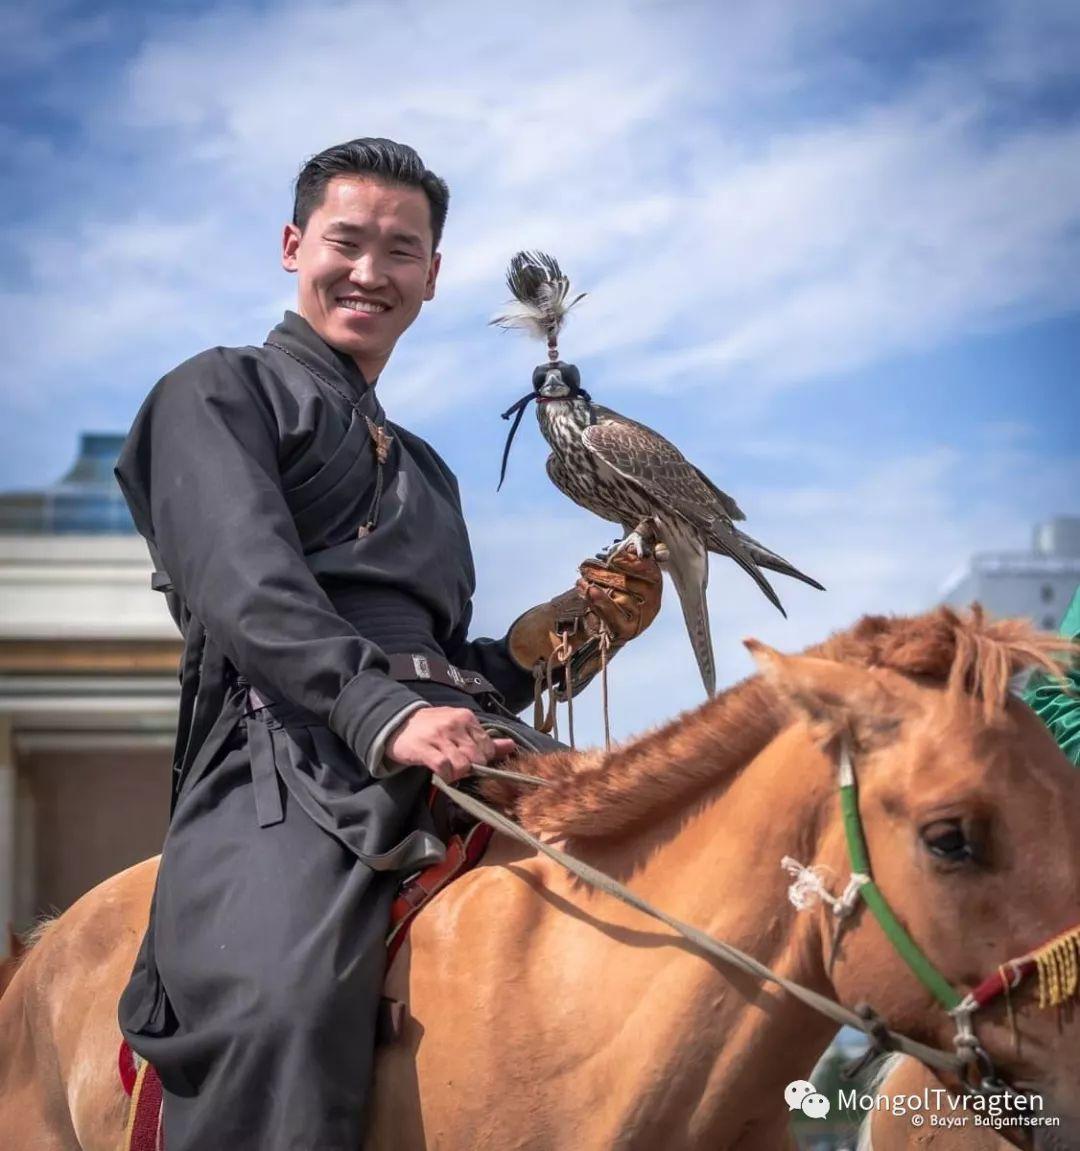 ᠮᠣᠩᠭᠣᠯ ᠨᠠᠭᠠᠳᠣᠮ 那达慕 第46张 ᠮᠣᠩᠭᠣᠯ ᠨᠠᠭᠠᠳᠣᠮ 那达慕 蒙古文化